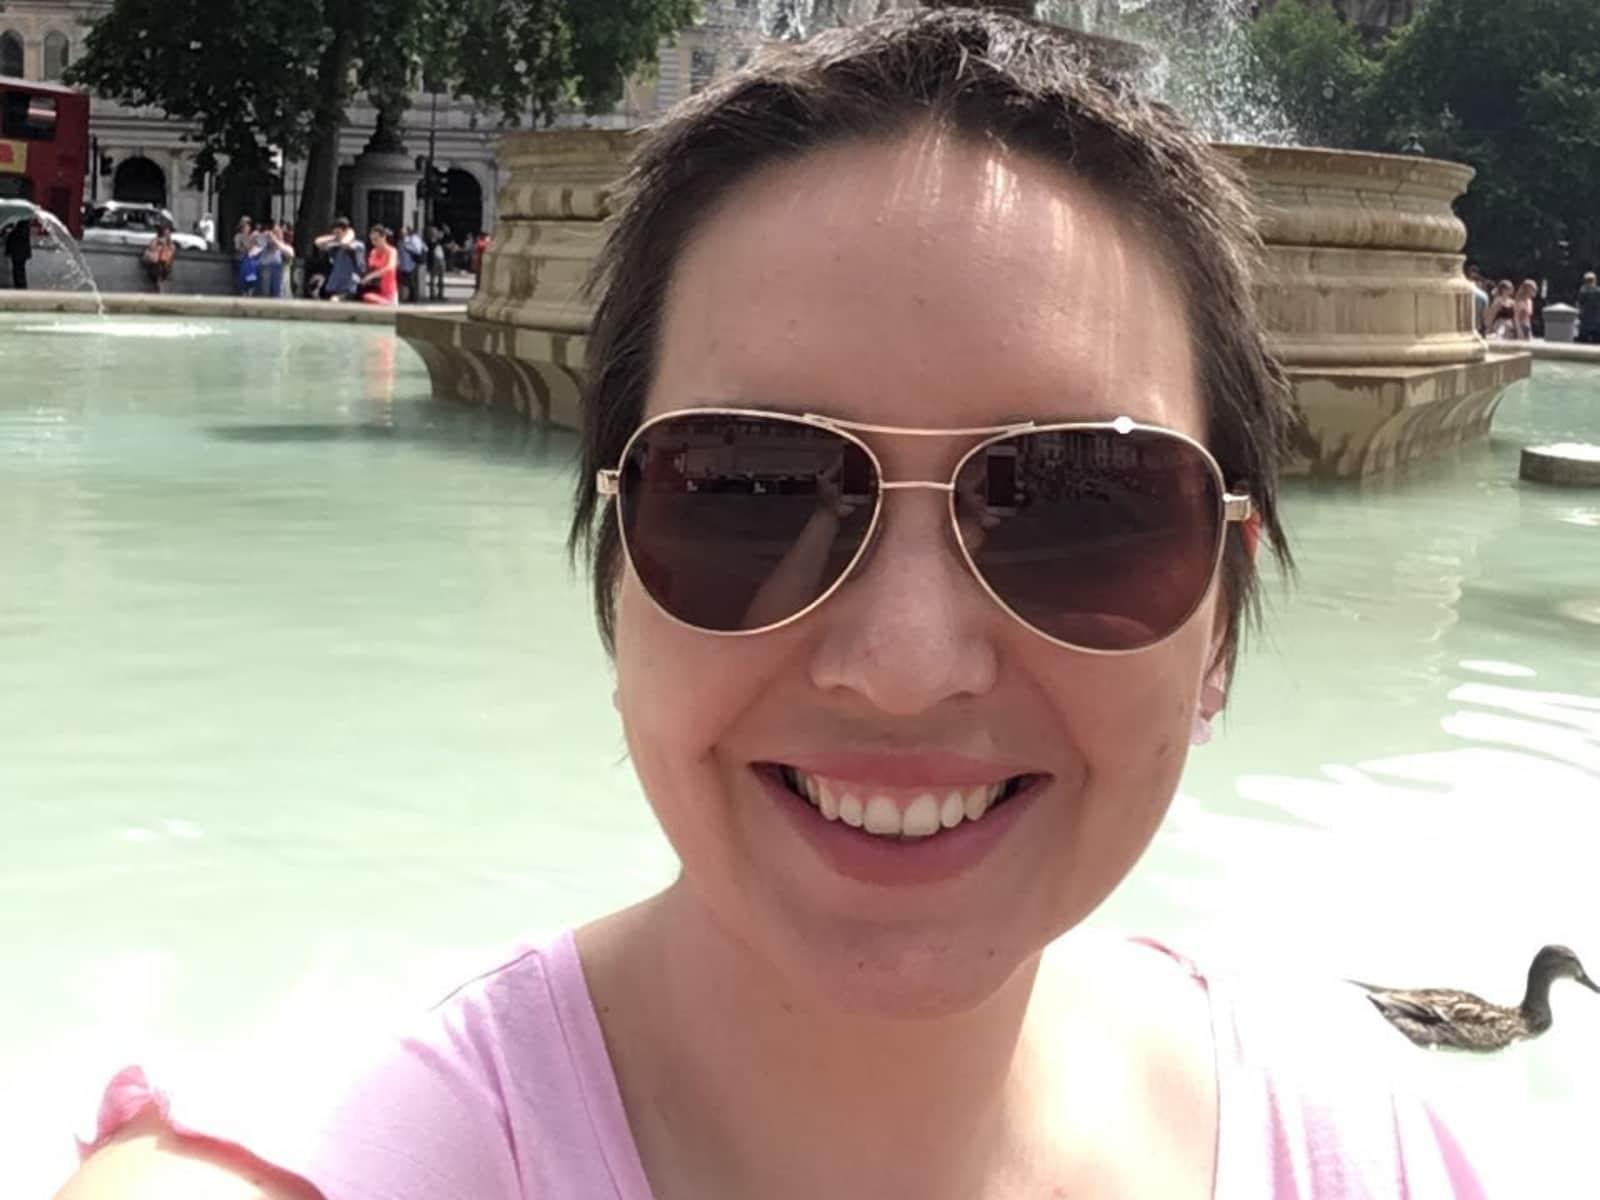 Helen from Canberra, Australian Capital Territory, Australia